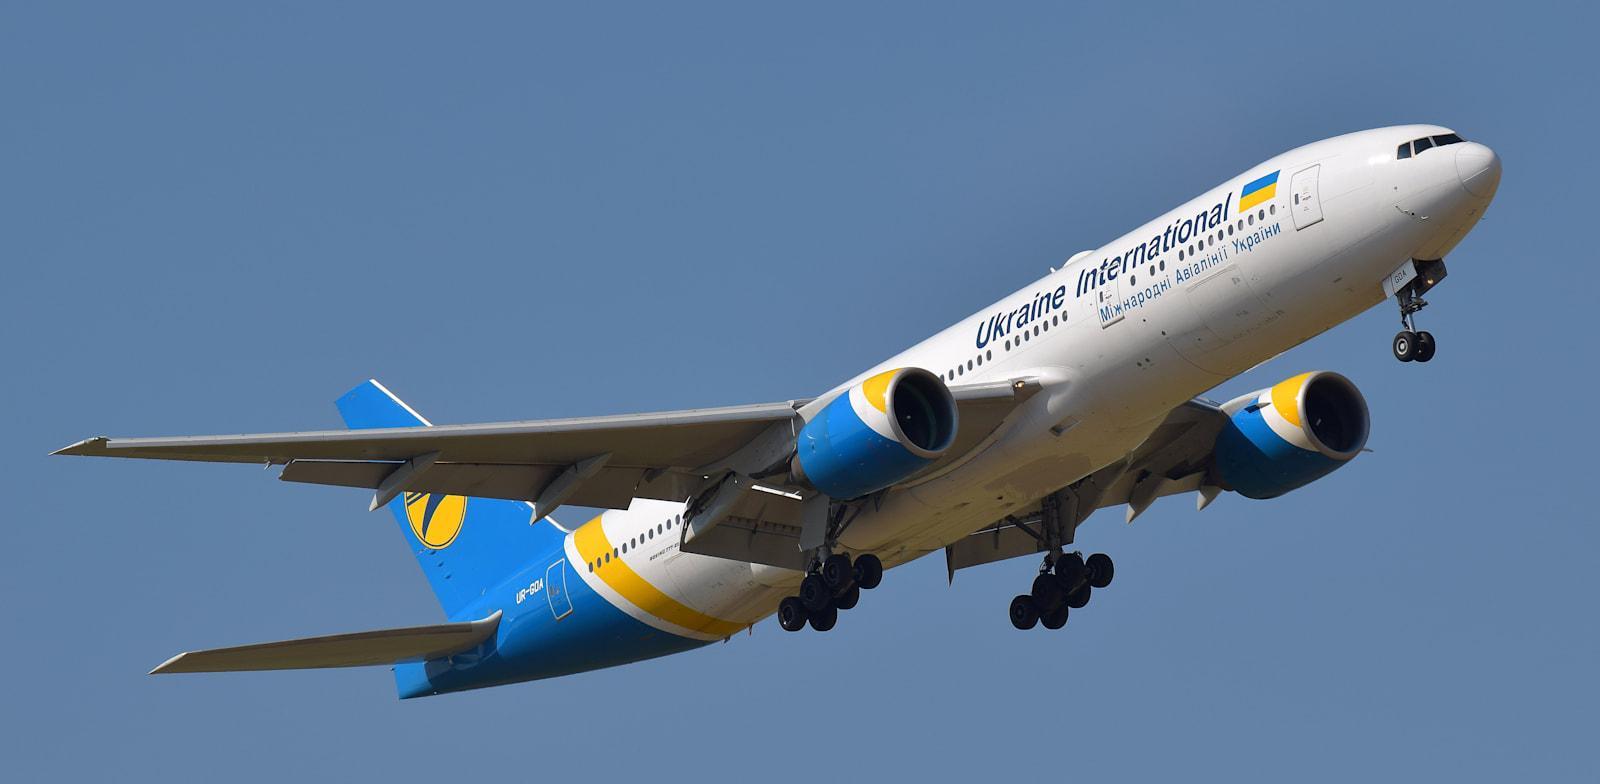 מטוס של יוקריין איירליינס אינטרנשיונל / צילום: Shutterstock